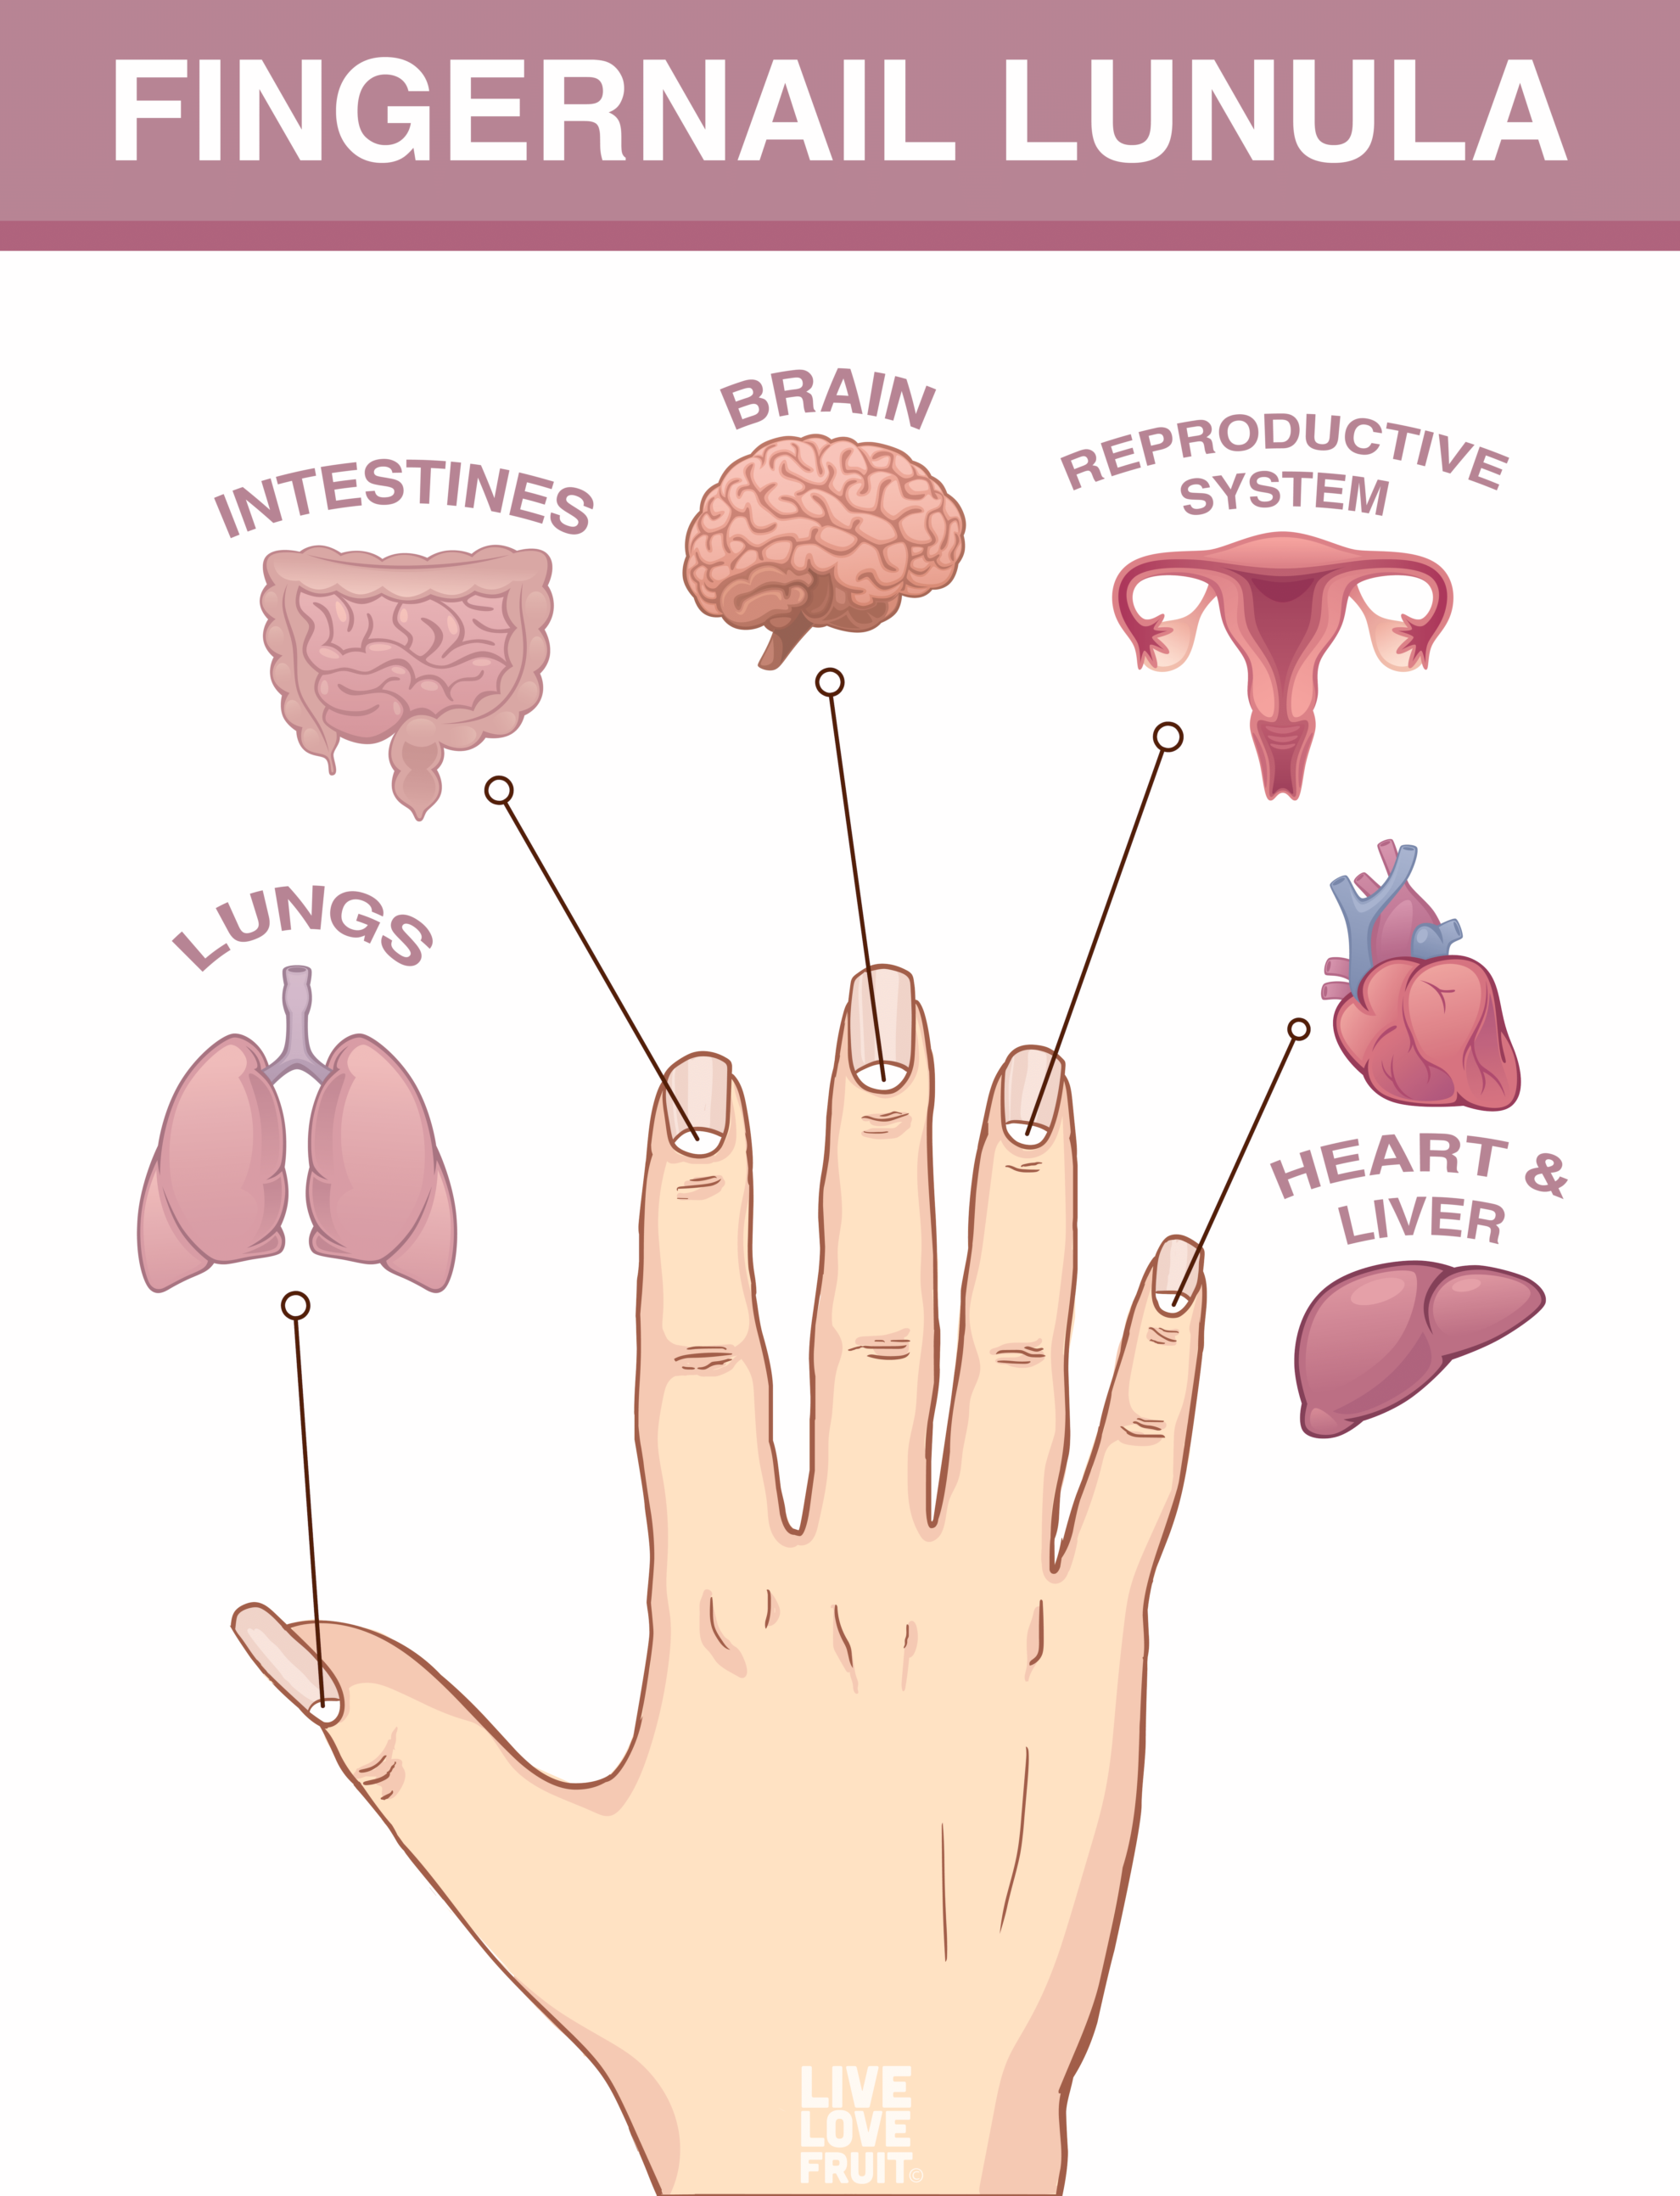 fingernail lunula